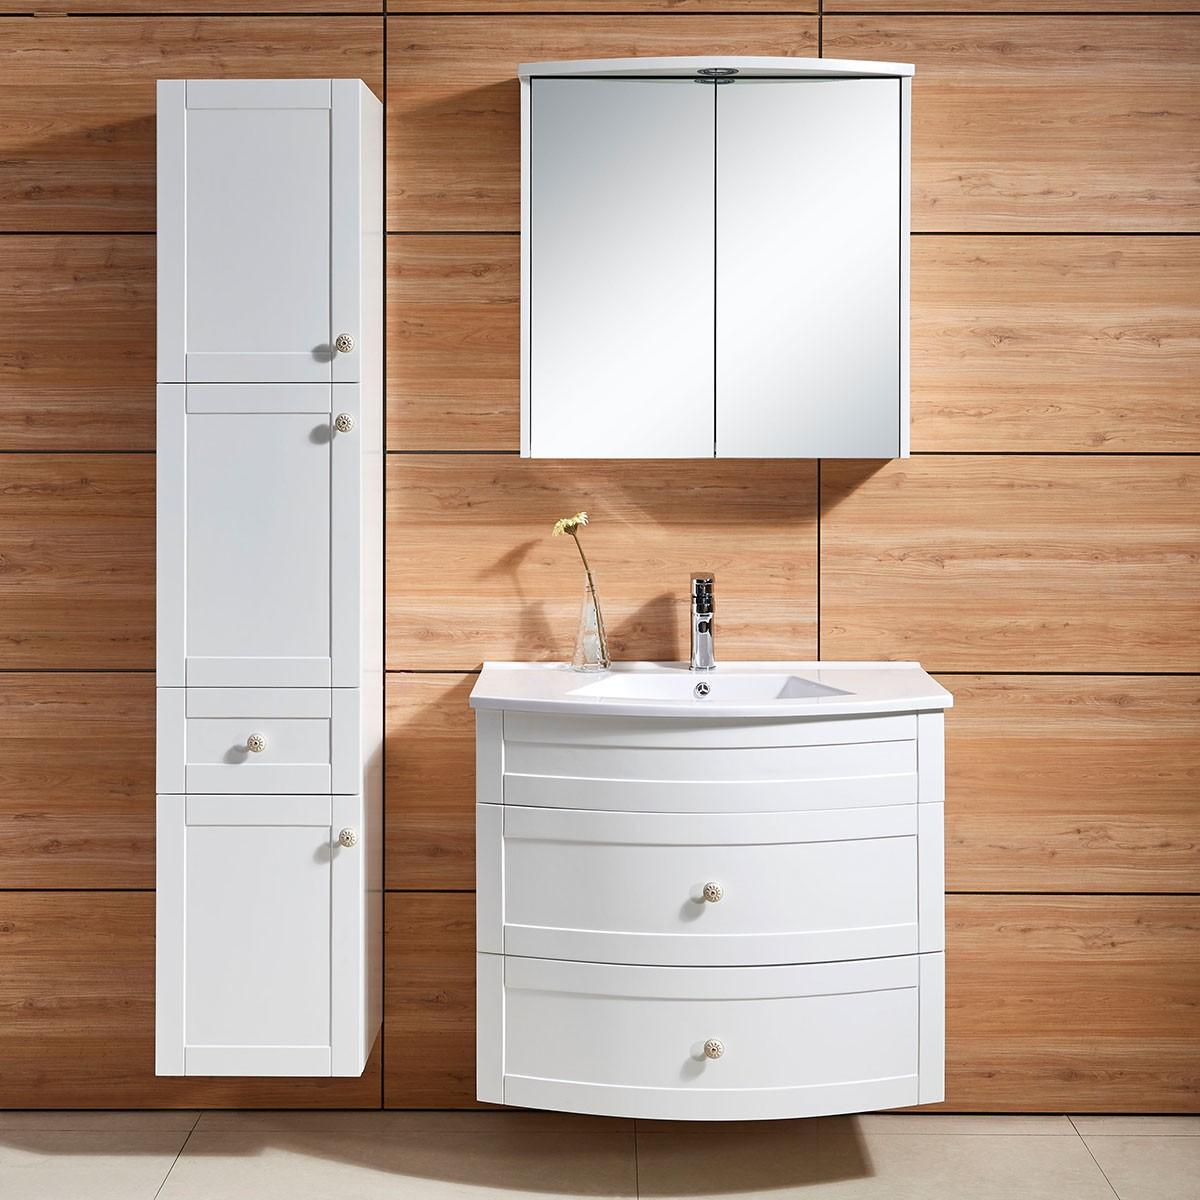 31 po meuble salle de bain suspendu au mur avec armoire for Meuble 70x30